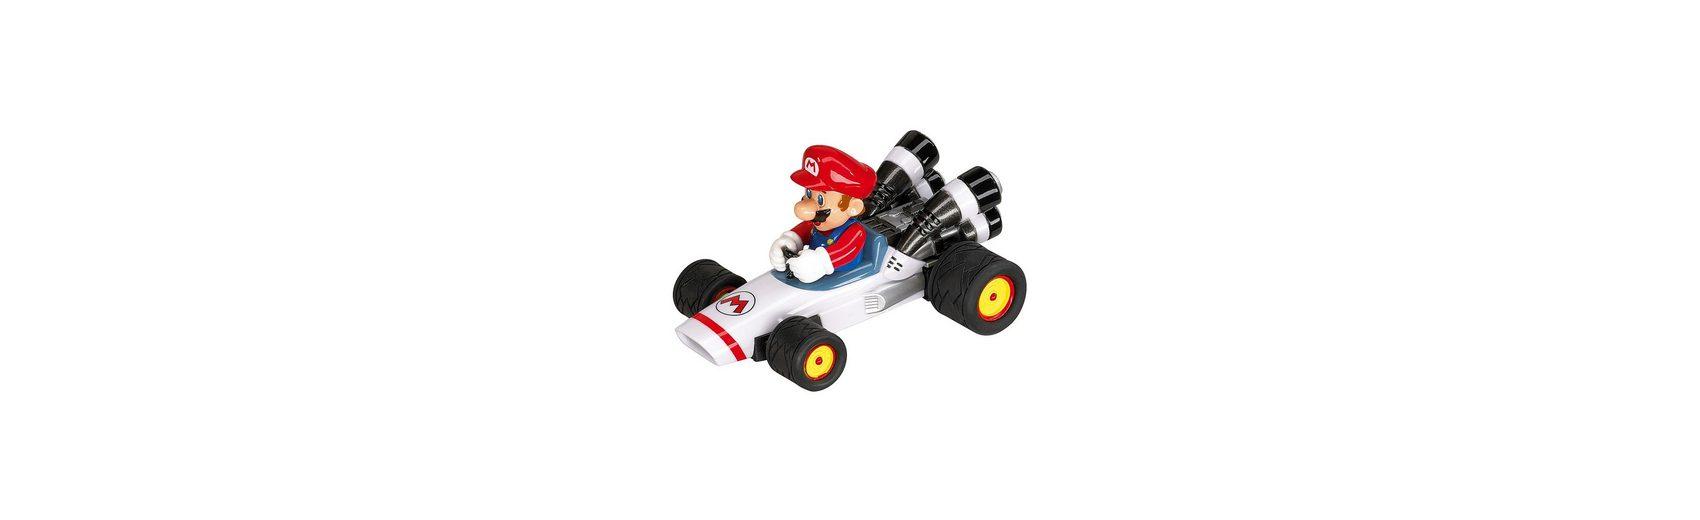 Stadlbauer Pull & Speed Nintendo Mario 3 pack (DS, Wii, 7)